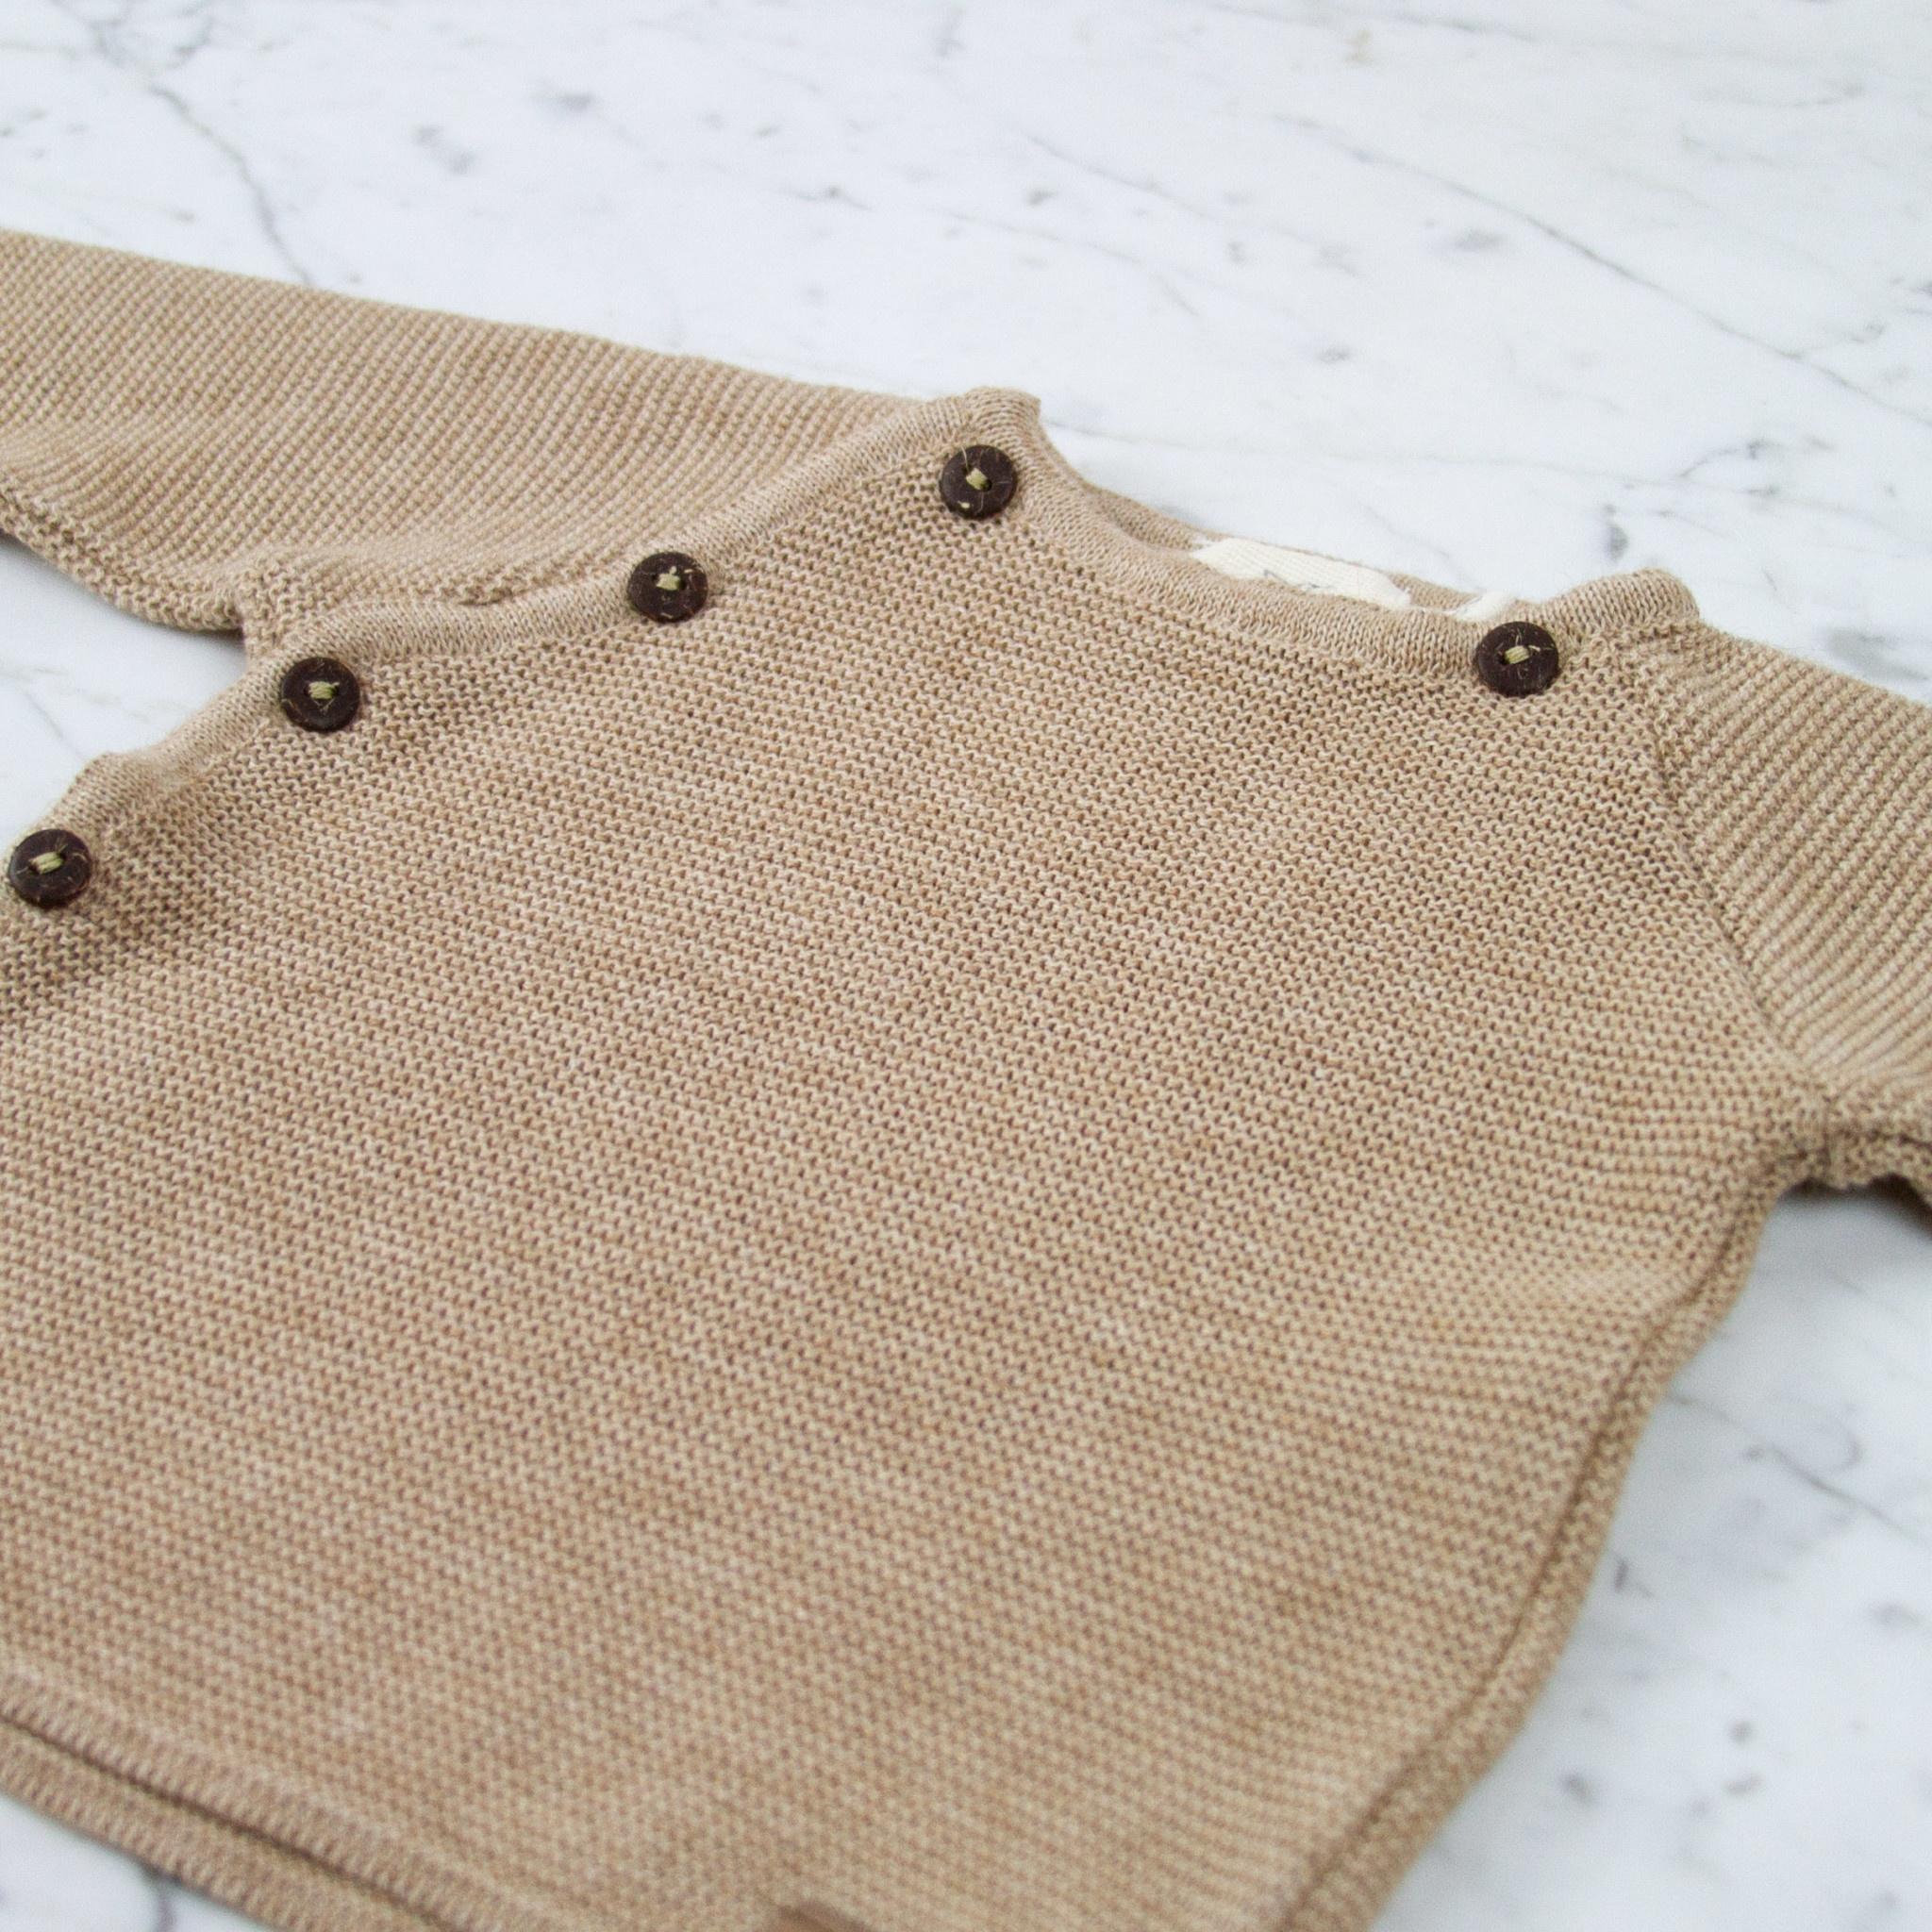 Petit Kolibri Alpaca + Cotton Knit Jacket Sweater - Brown - 3-6 Month